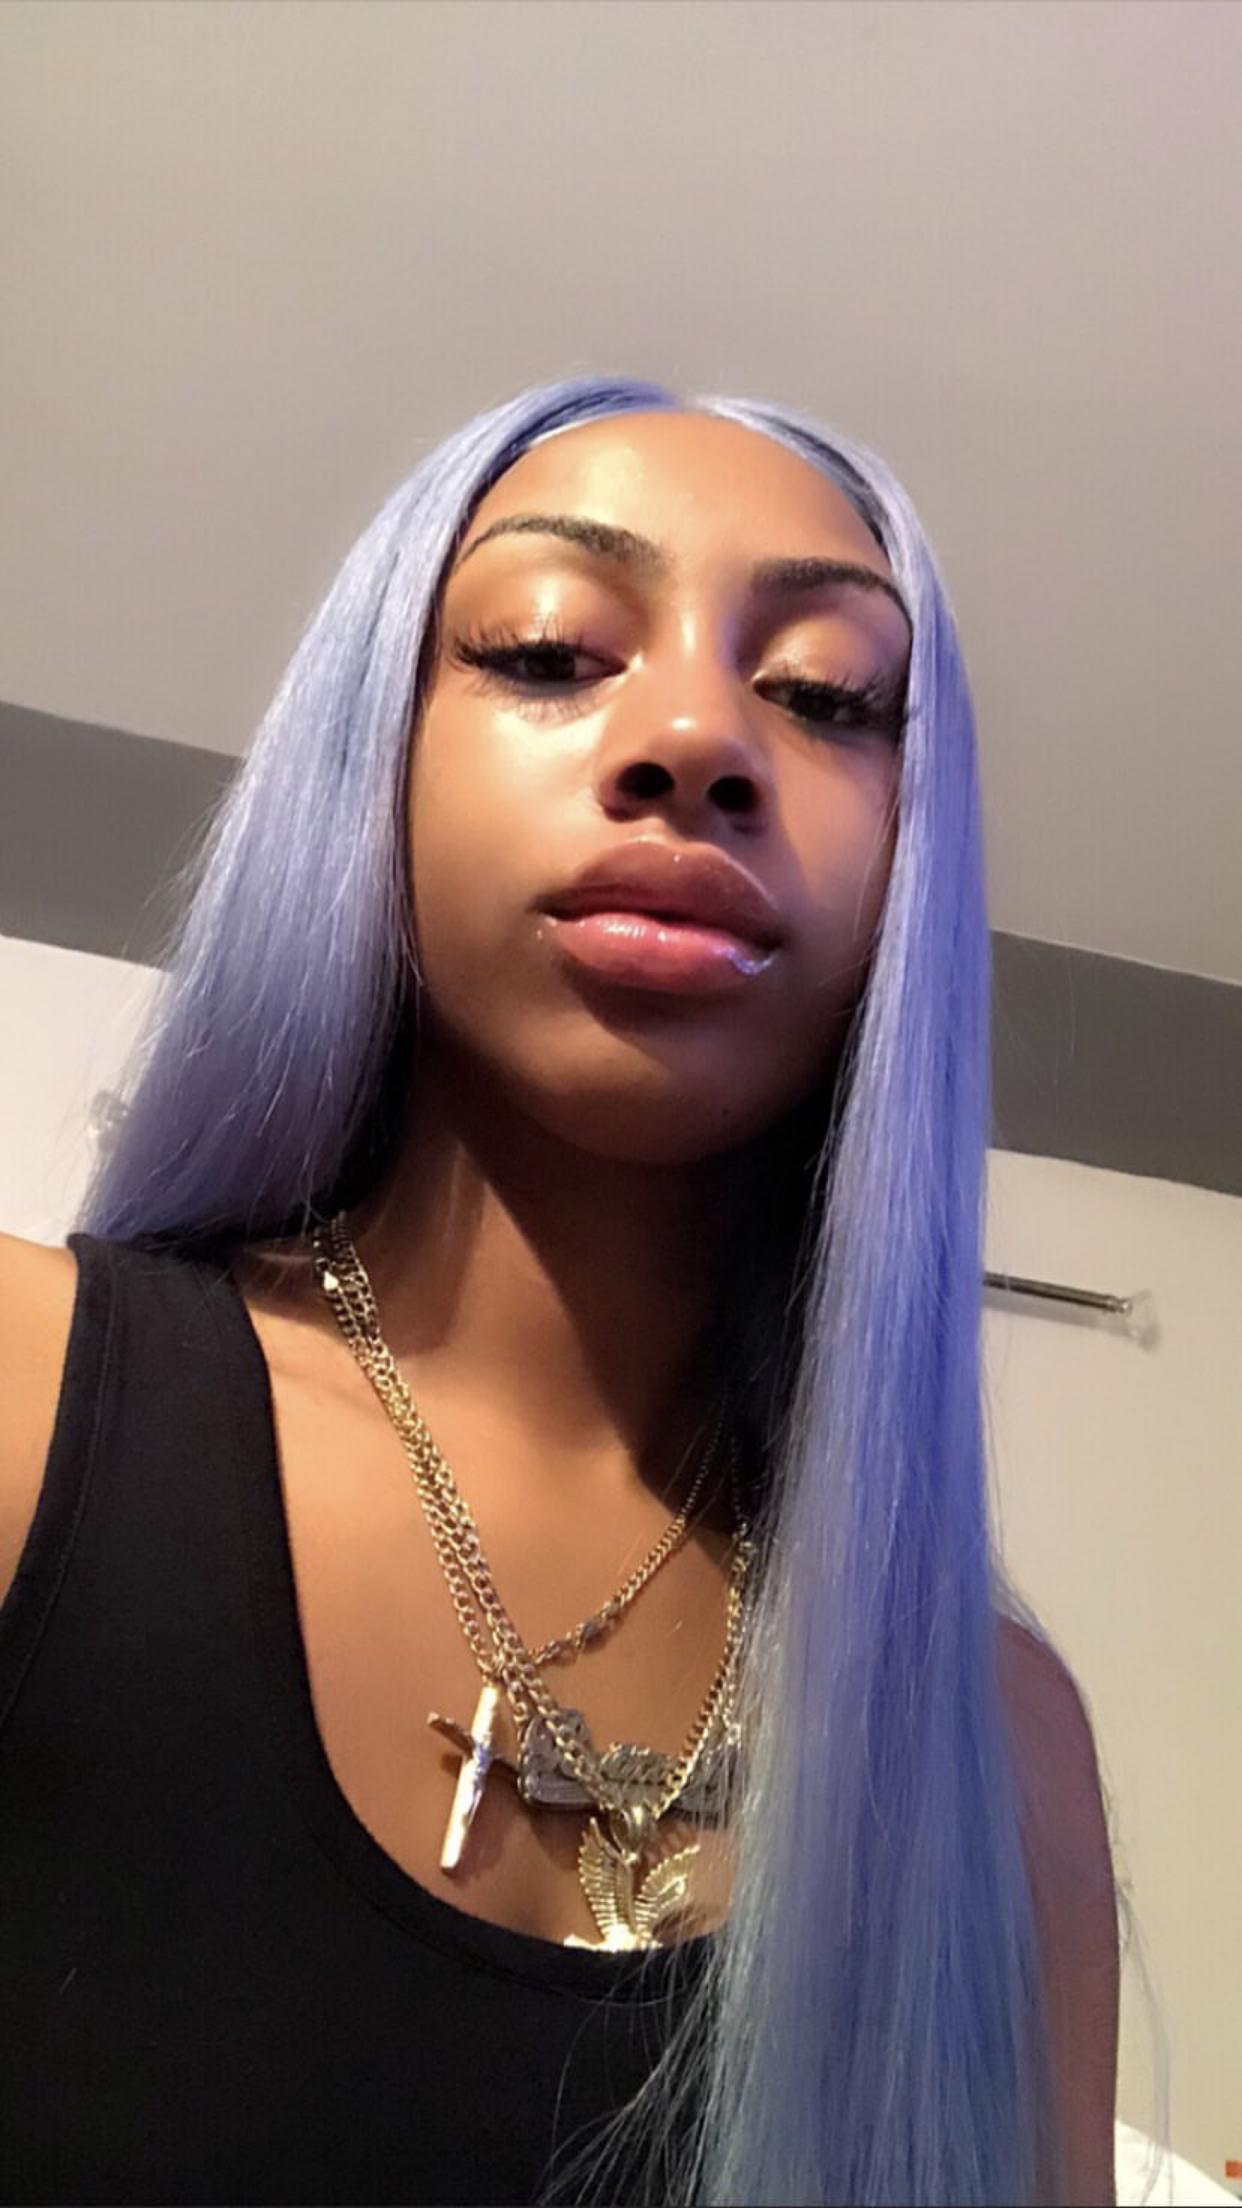 Pintrestbabylaaa gf pinterest baddies black girls hairstyles